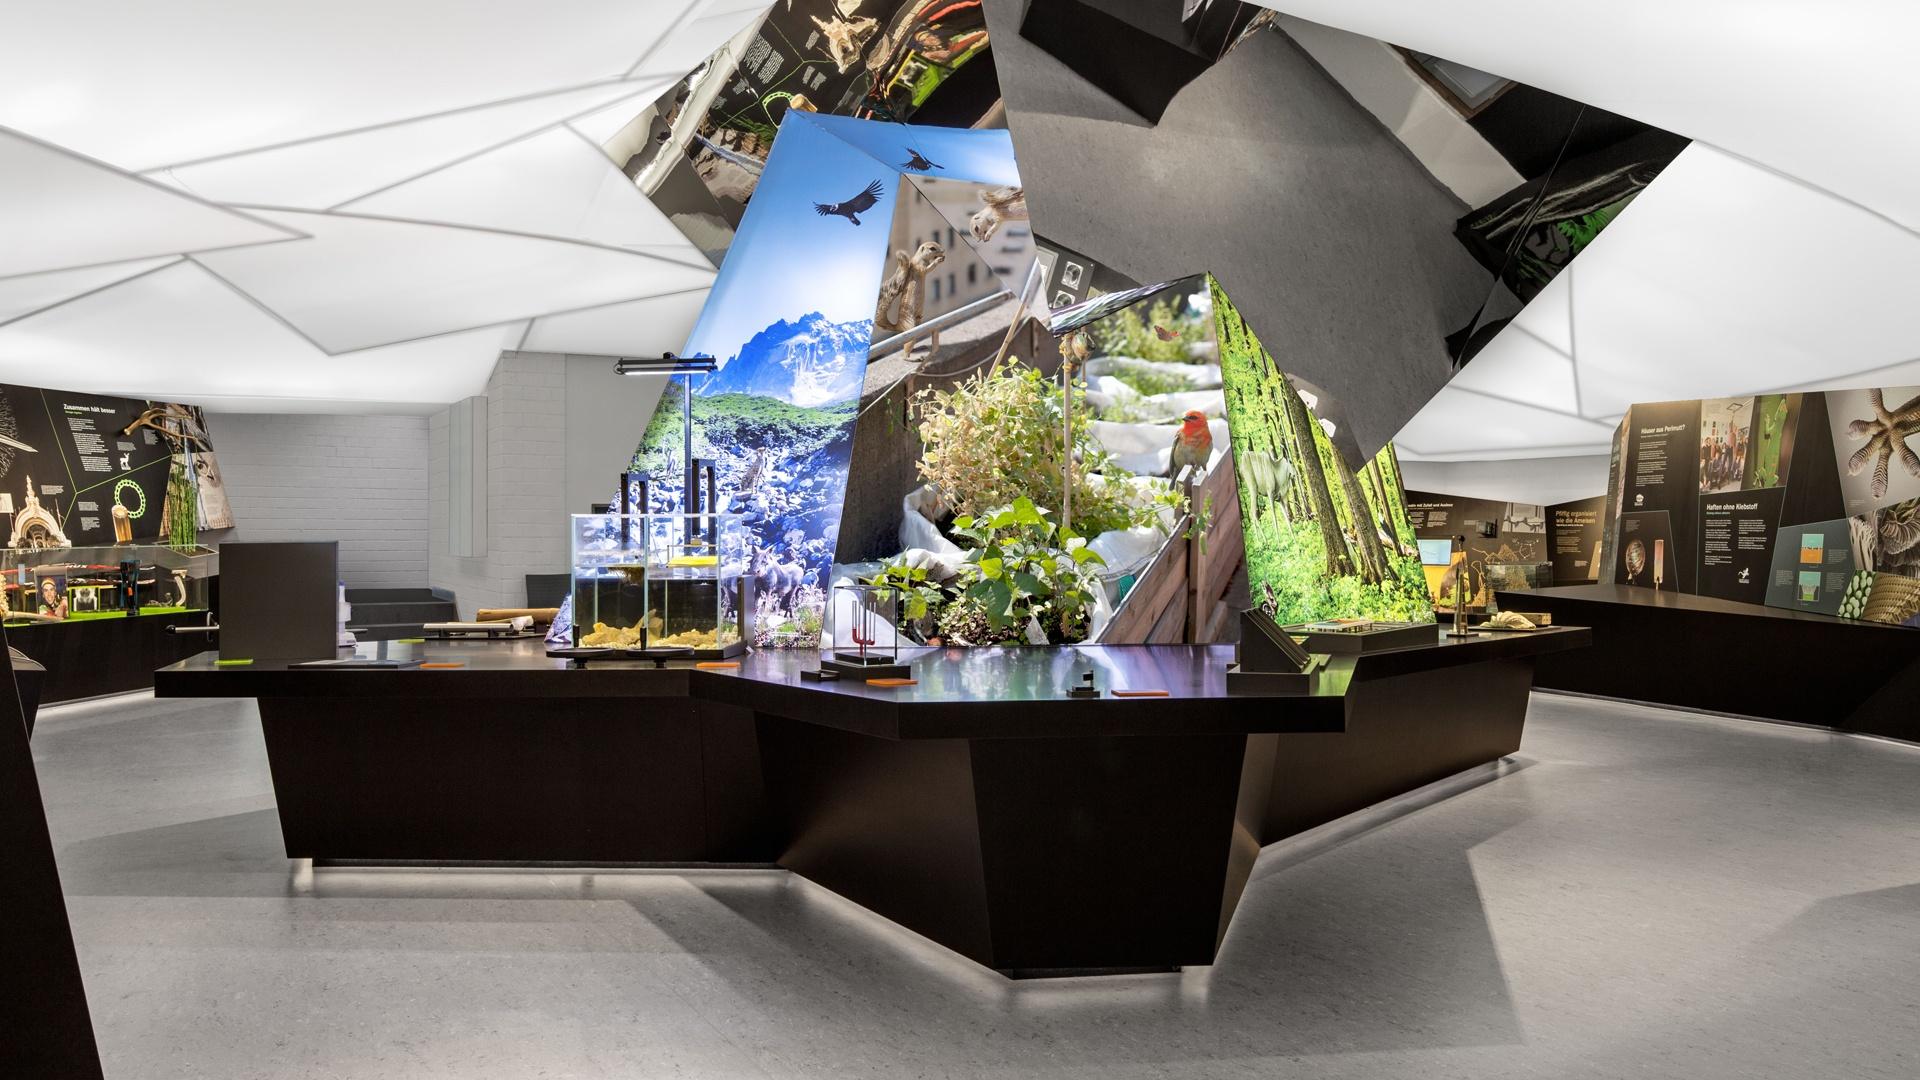 Ausstellung Bionicum Tiergarten Nürnberg